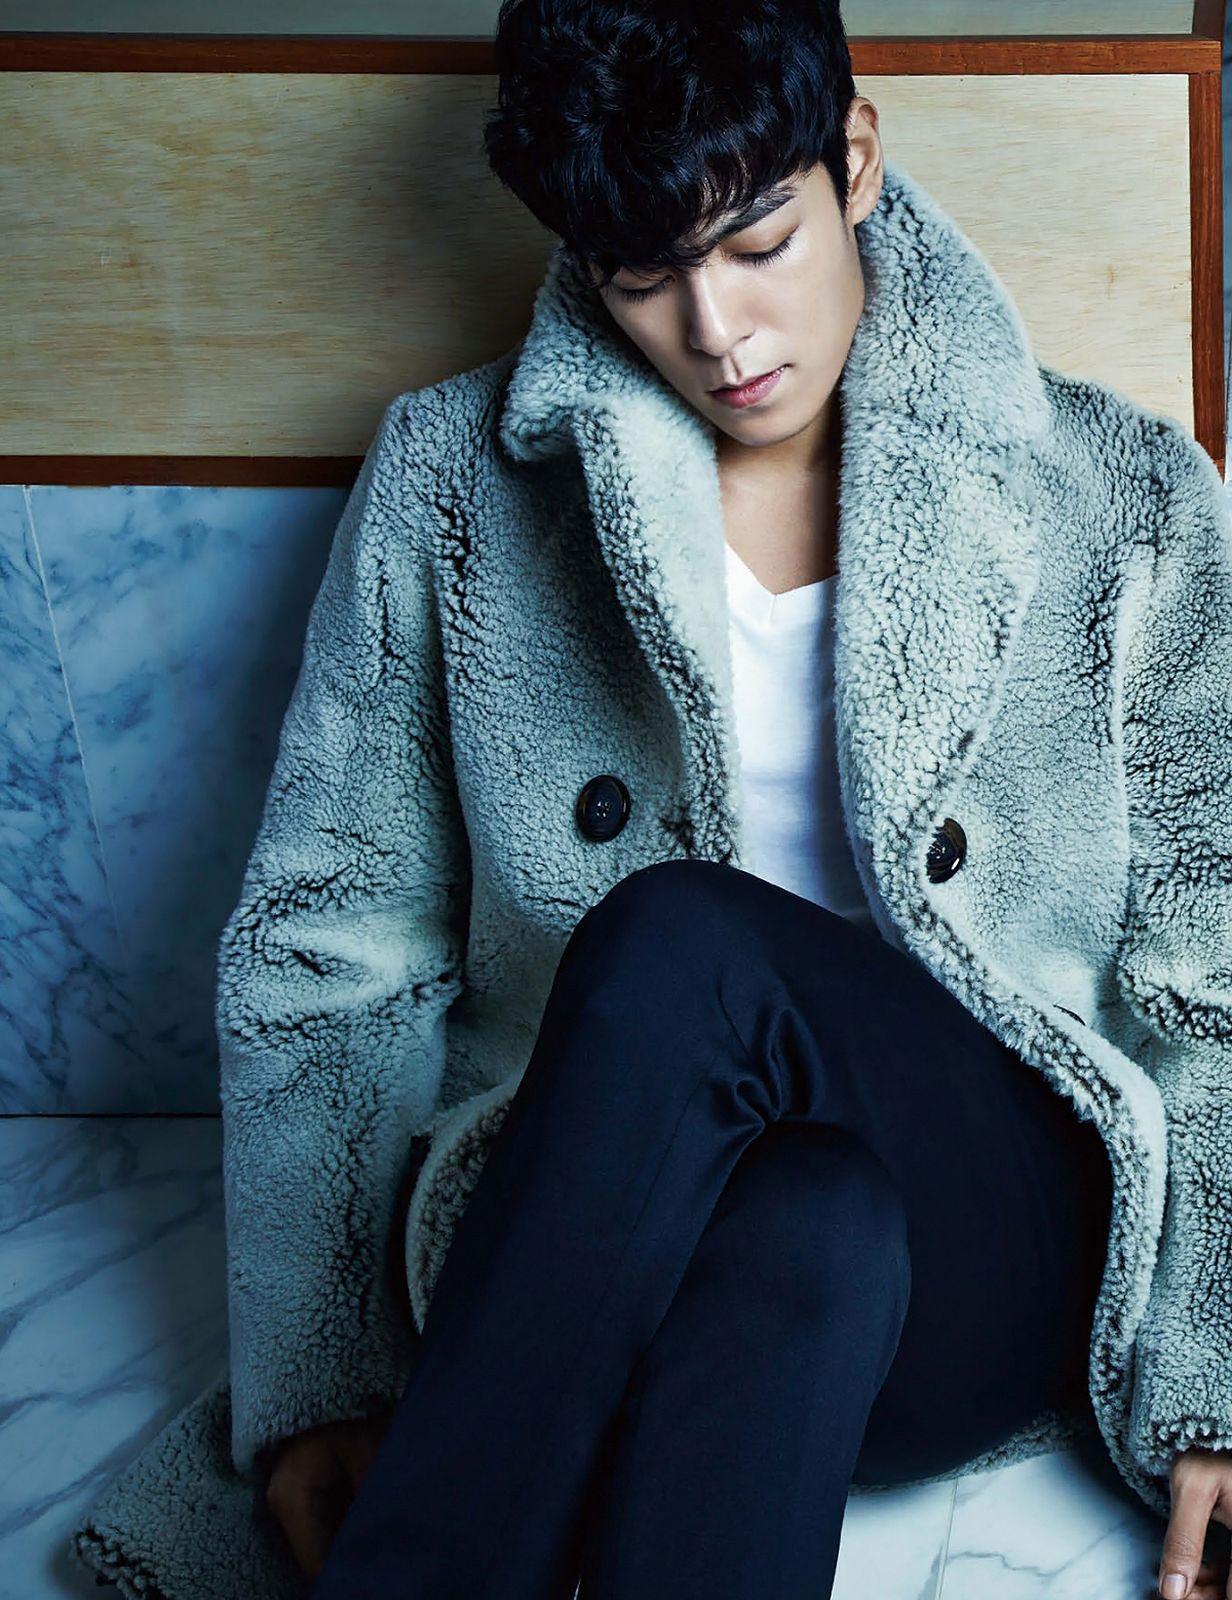 [HQ] T.O.P for Harper's Bazaar Korea 1232x1600